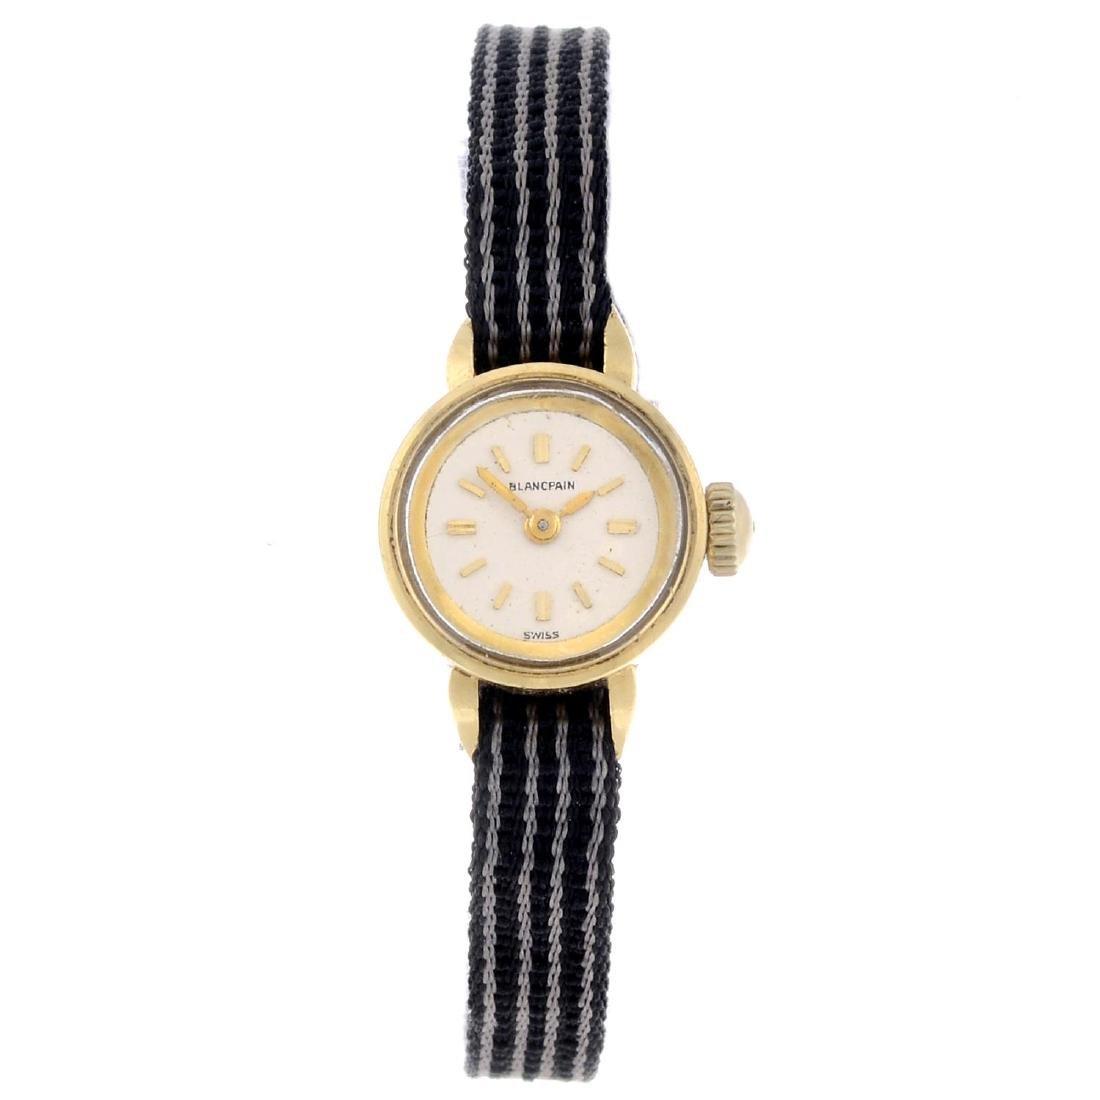 BLANCPAIN - a lady's wrist watch. Yellow metal case.